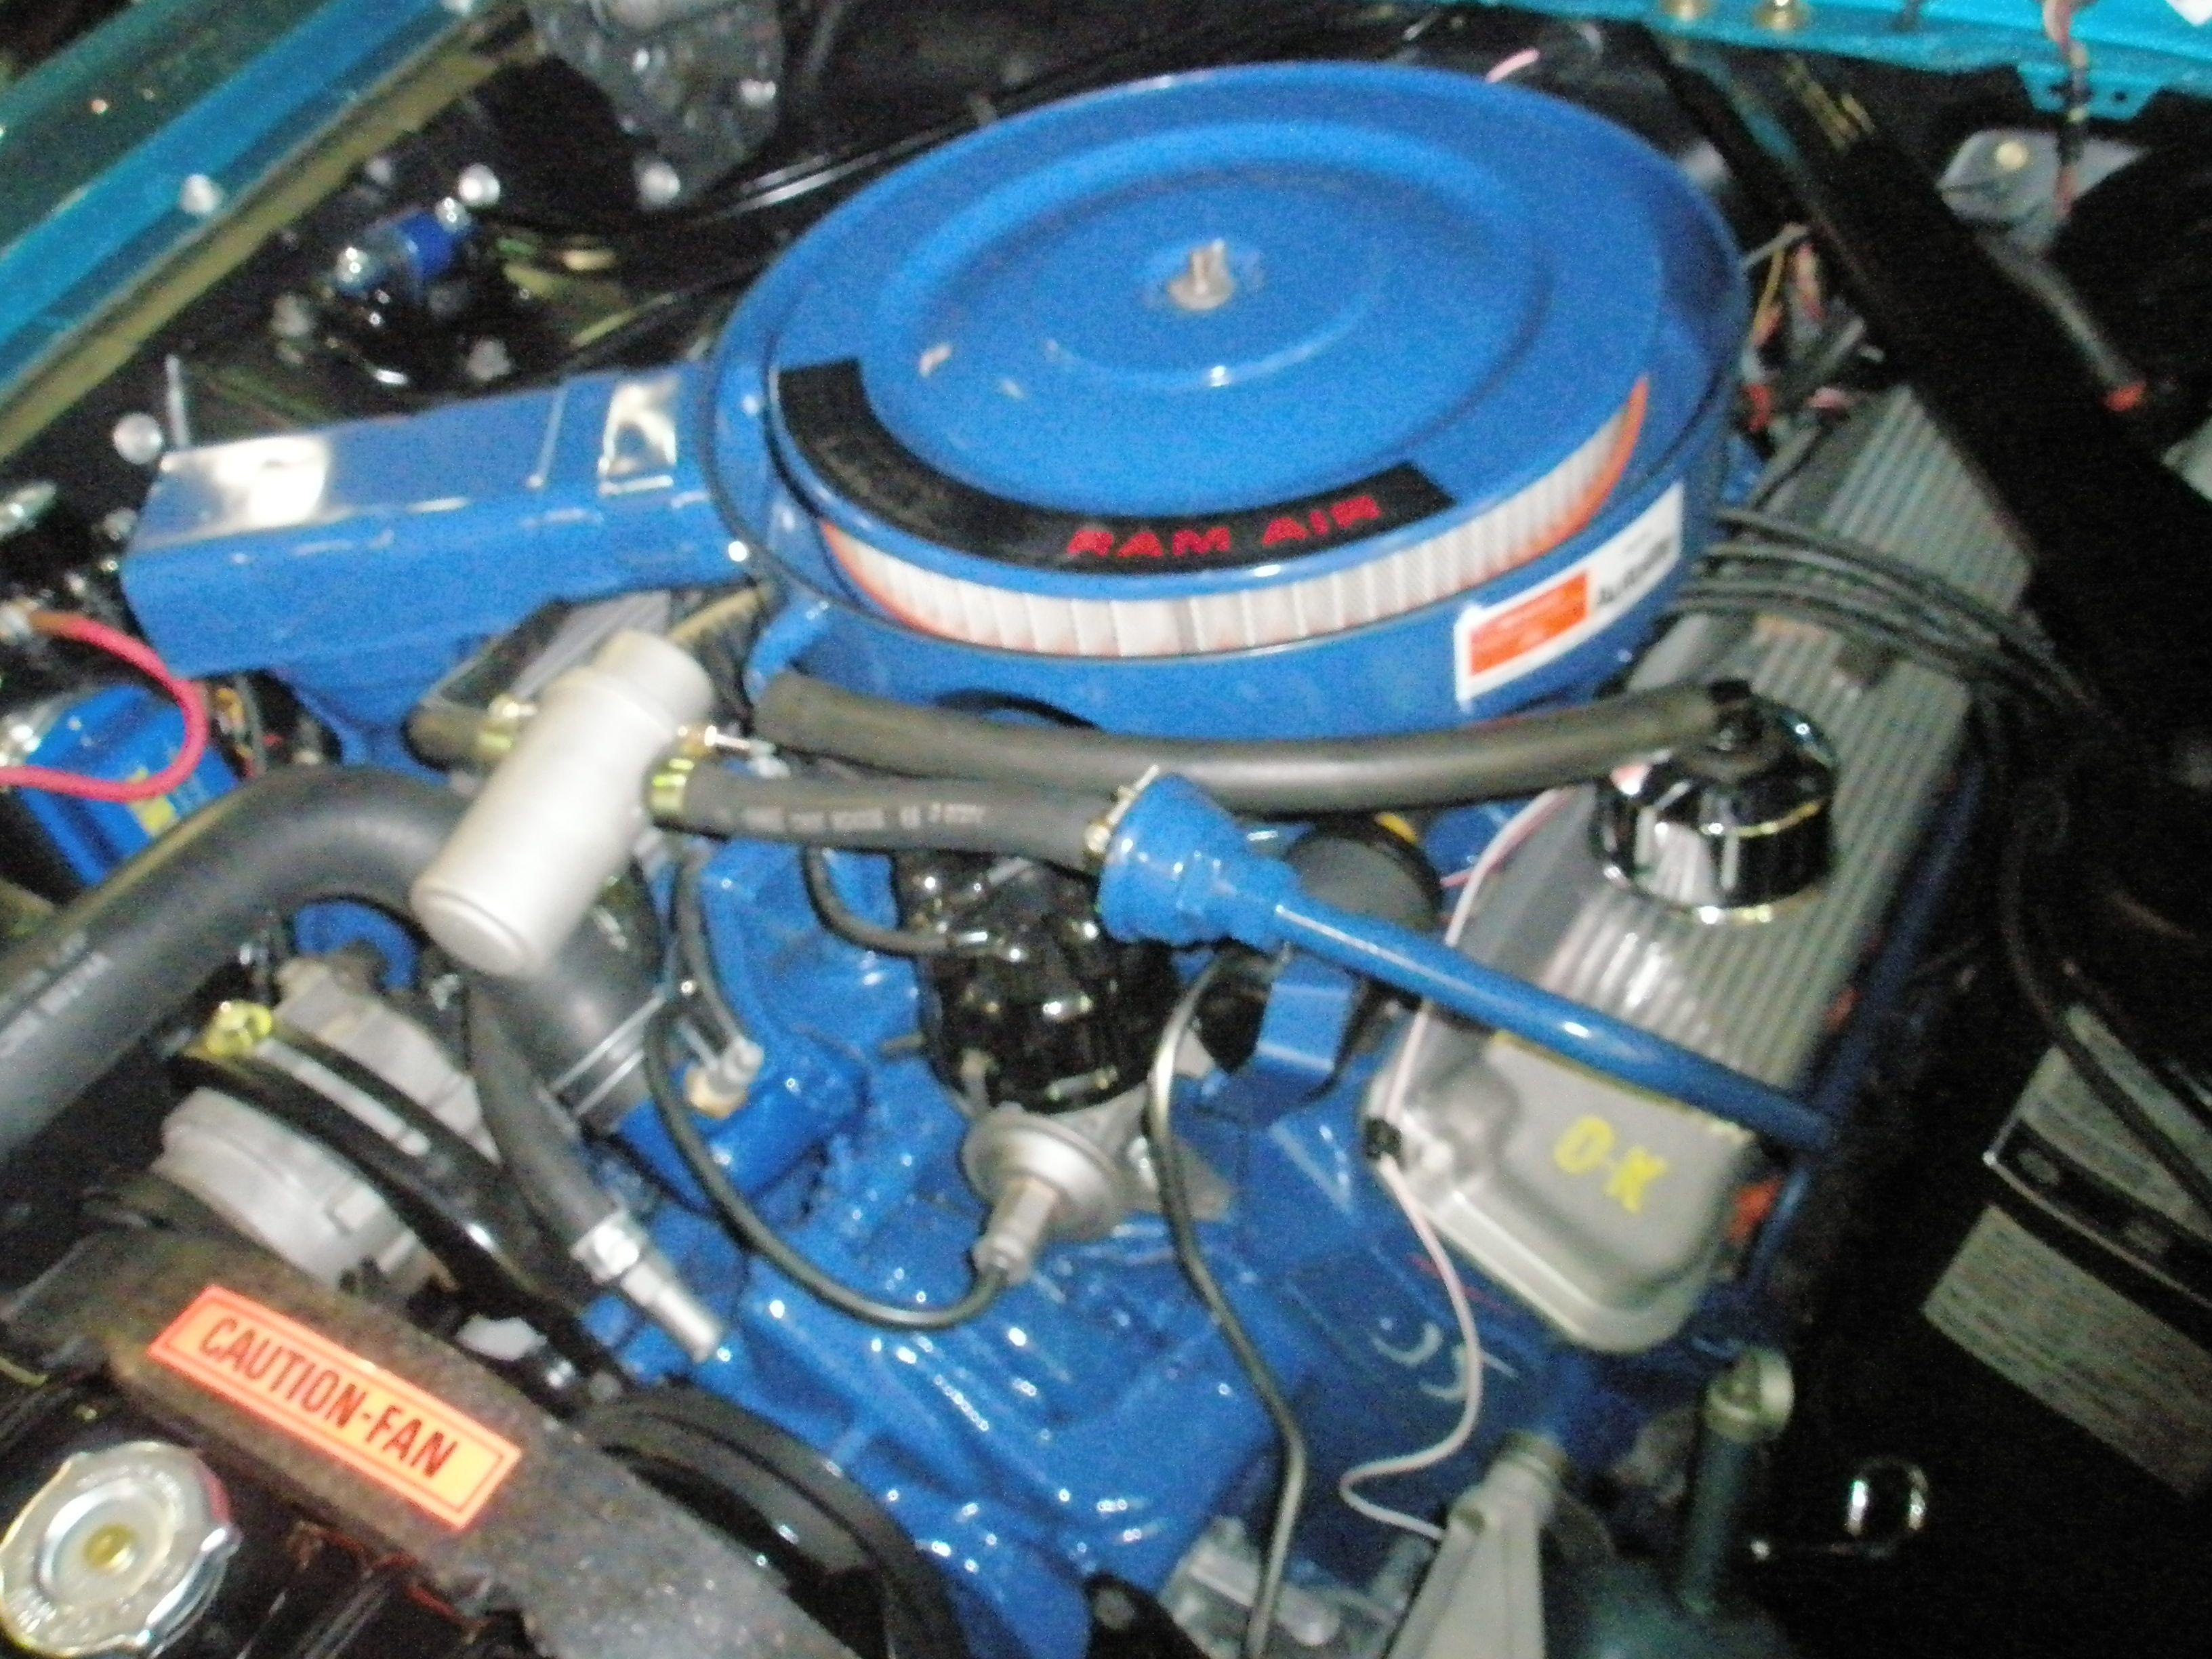 1969 Shelby GT 500 428 Super Cobra Jet engine Still has correct